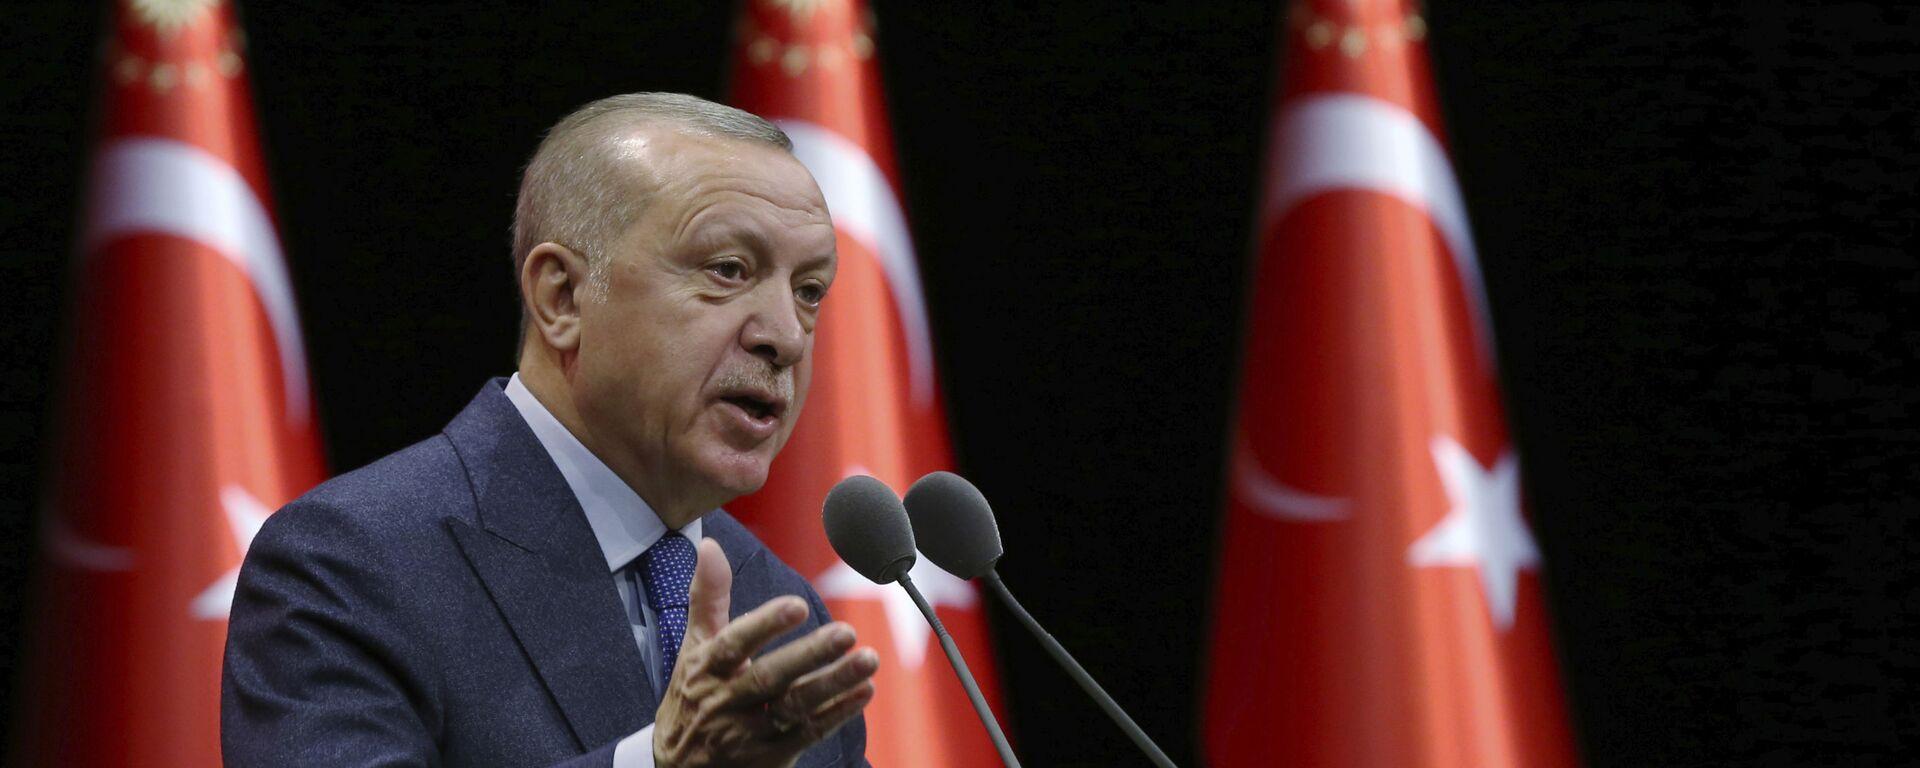 Turecký prezident Recep Tayyip Erdogan - Sputnik Česká republika, 1920, 24.09.2021